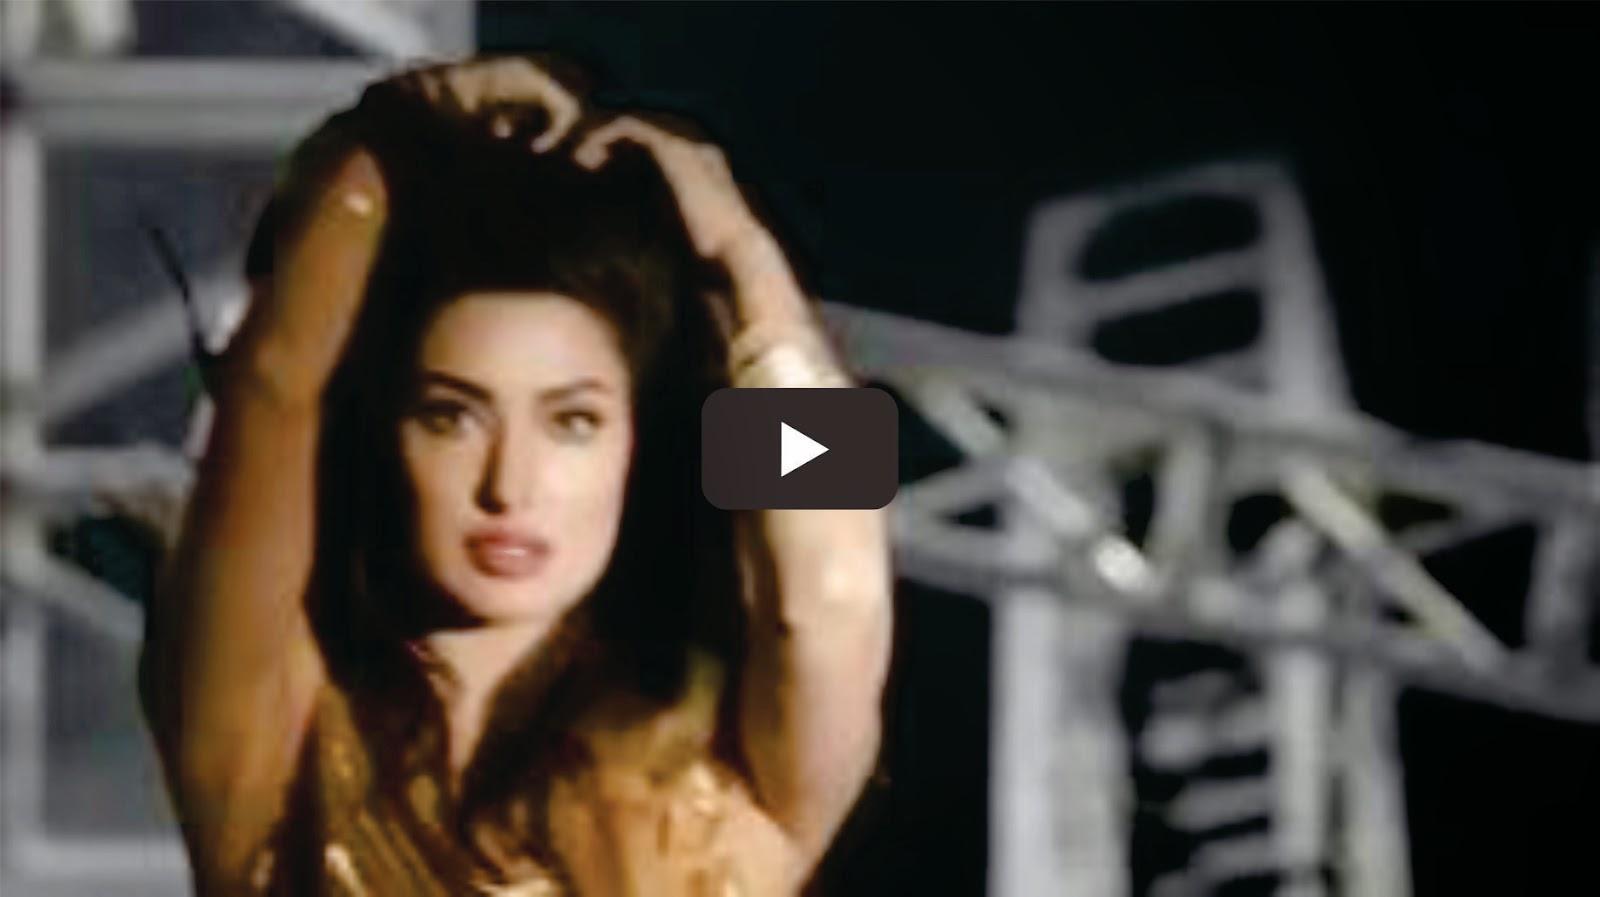 Hot video song full hd